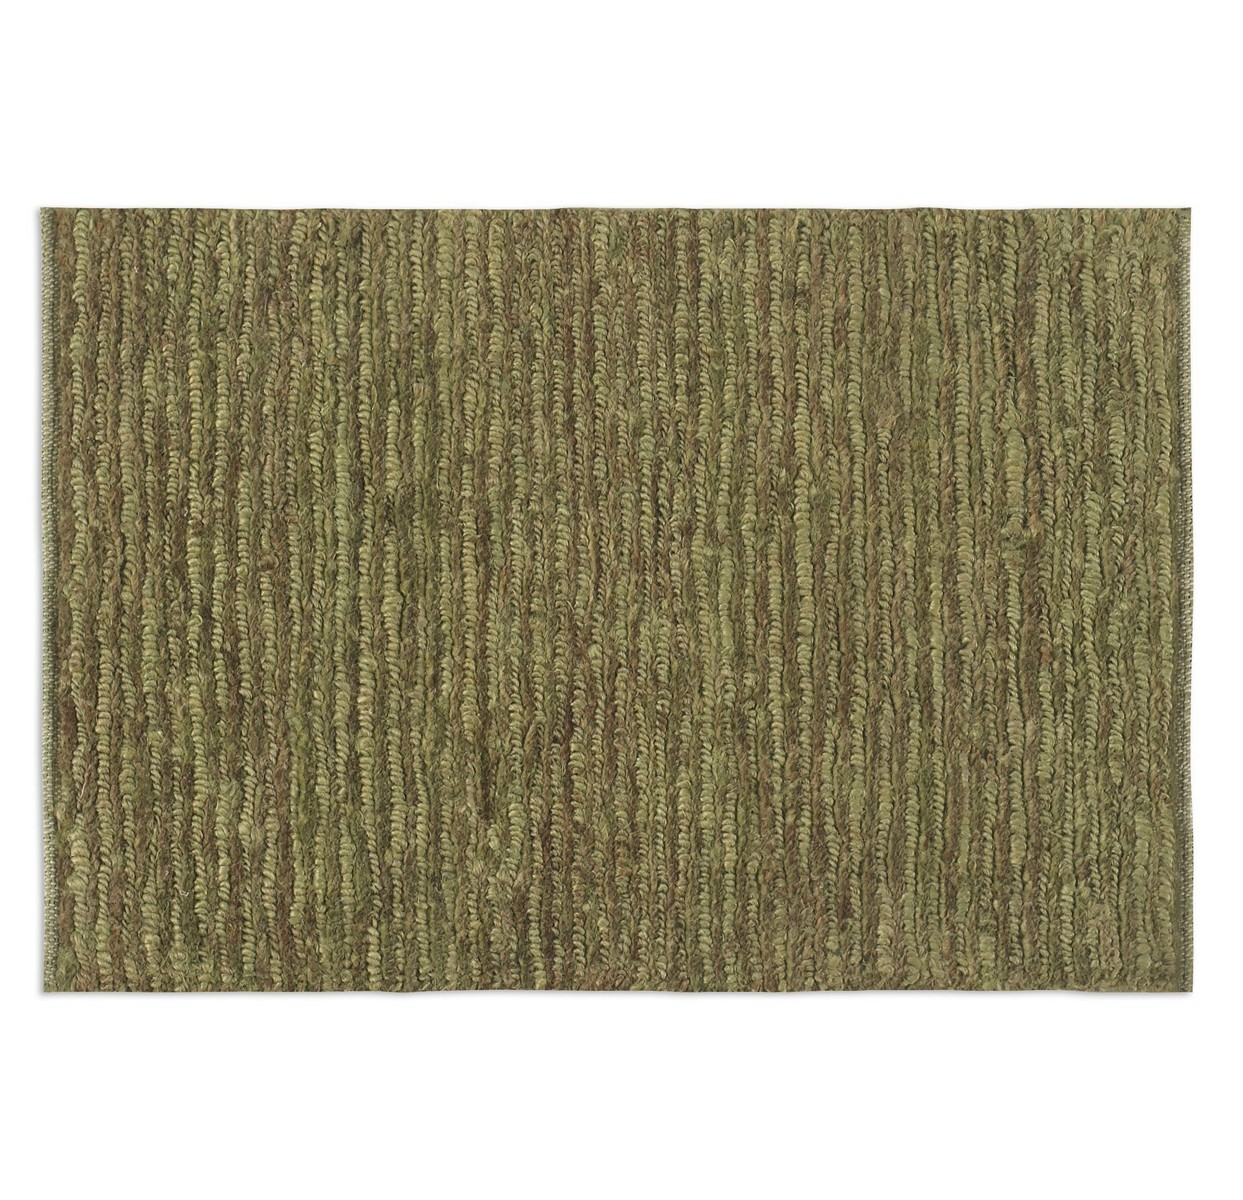 Uttermost Jessore 8 X 10 Rug - Green